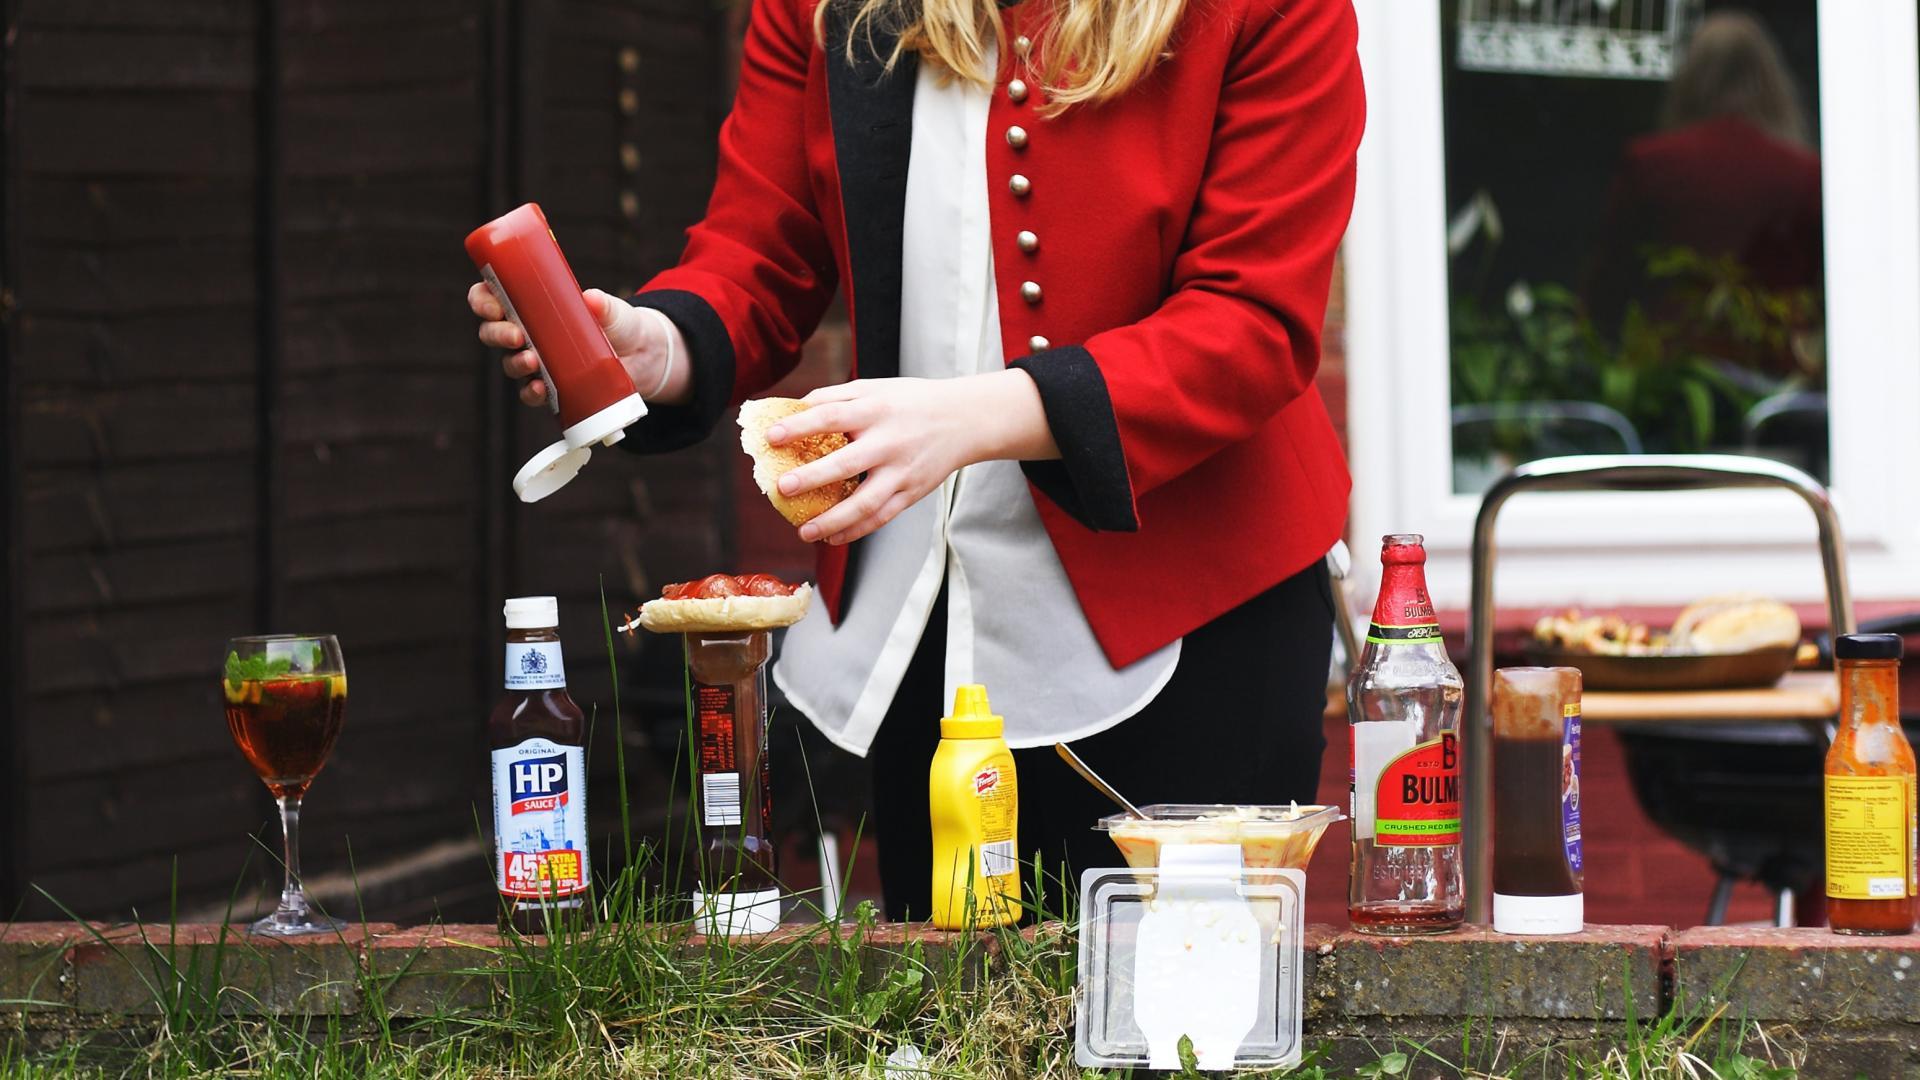 frau grillen lecker ketchup essen